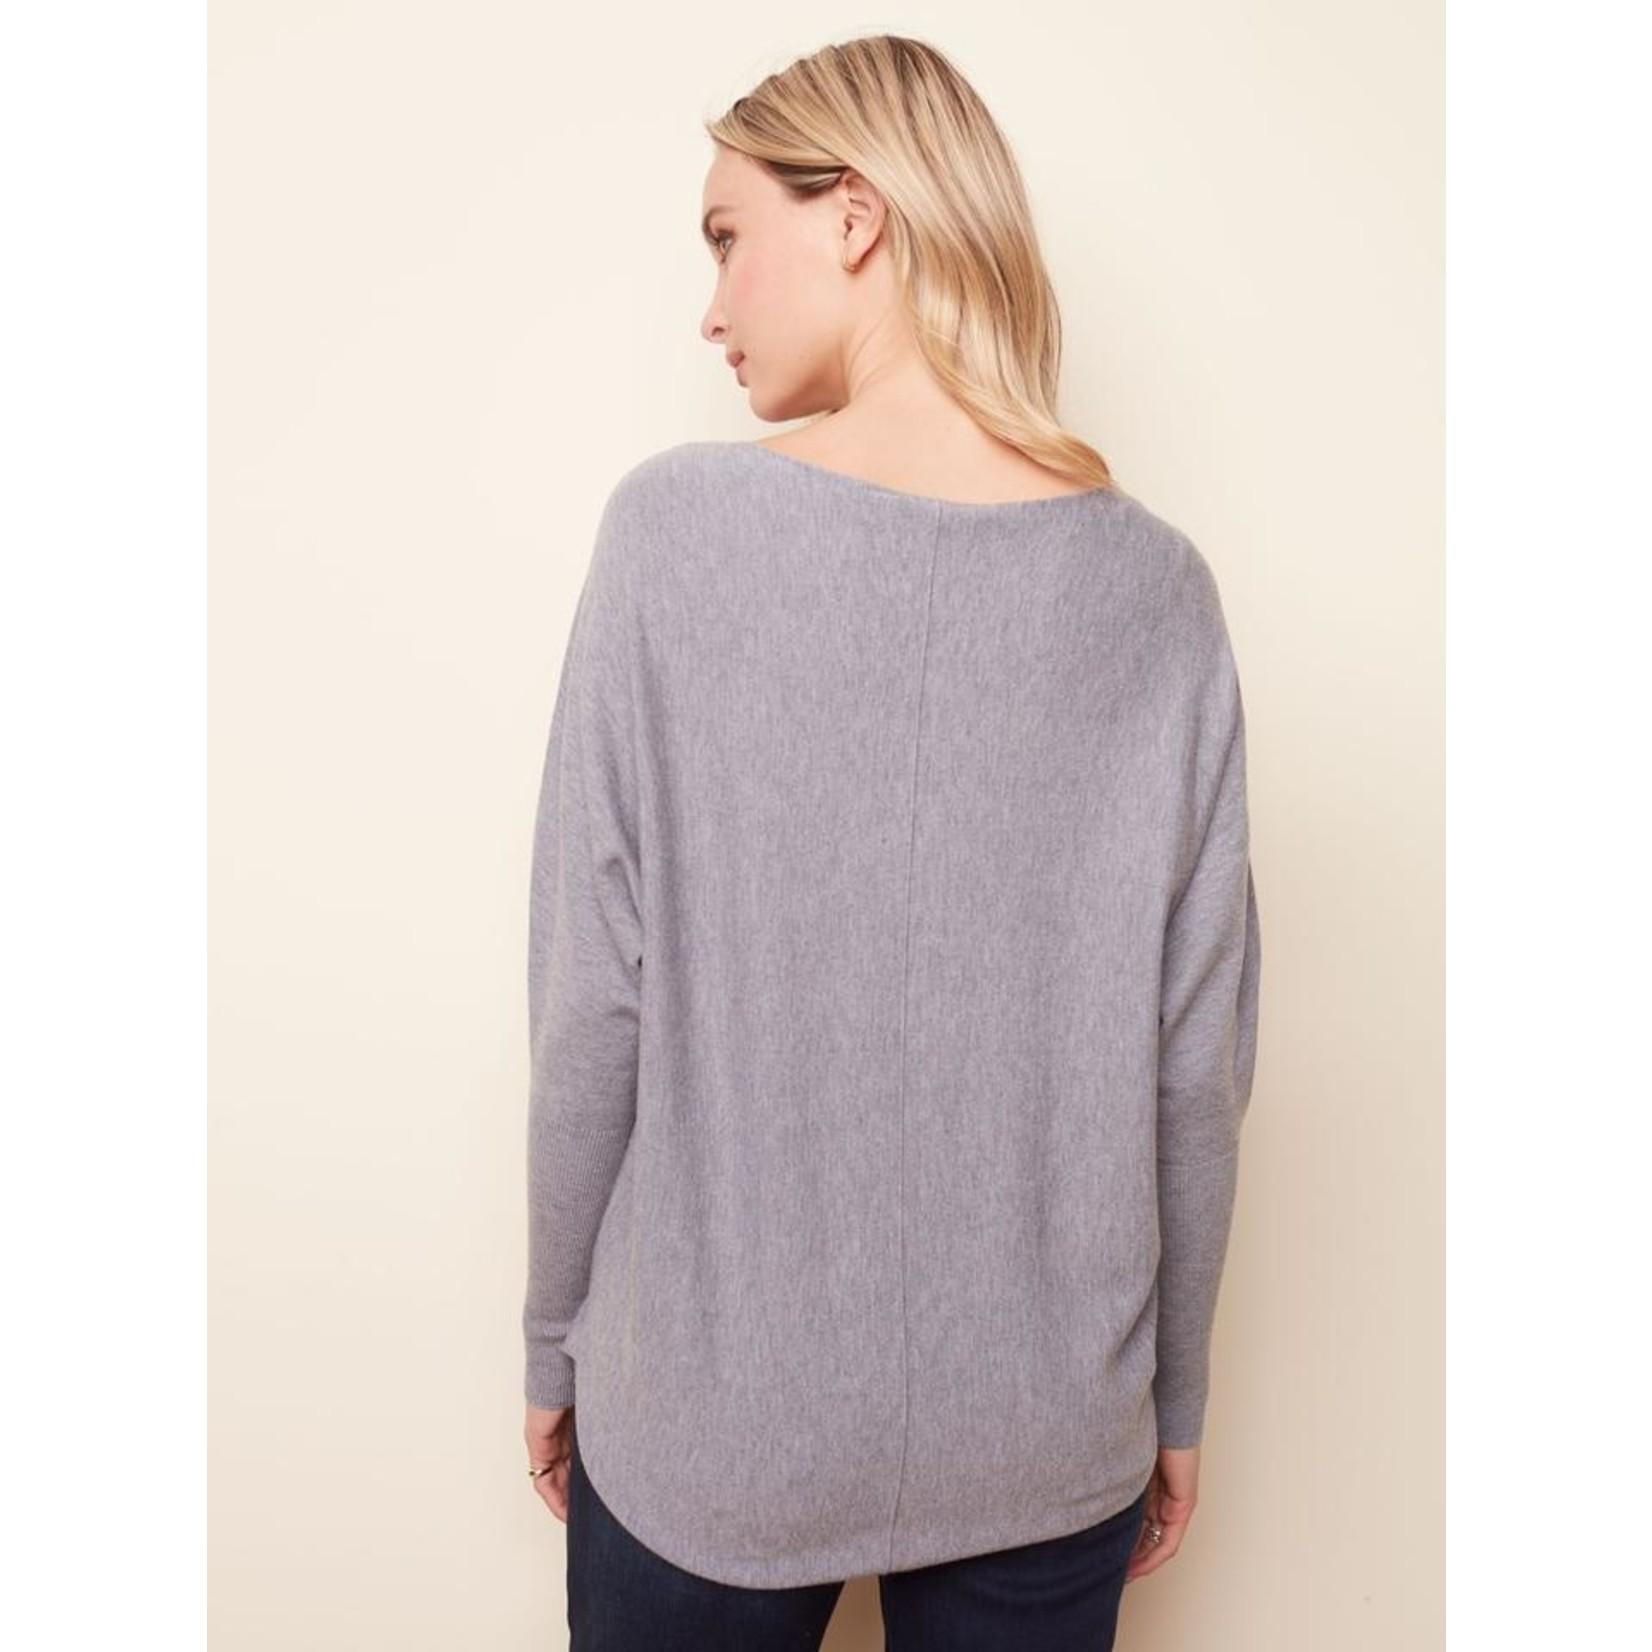 CharlieB Long Bat Dolman Sleeve Sweater